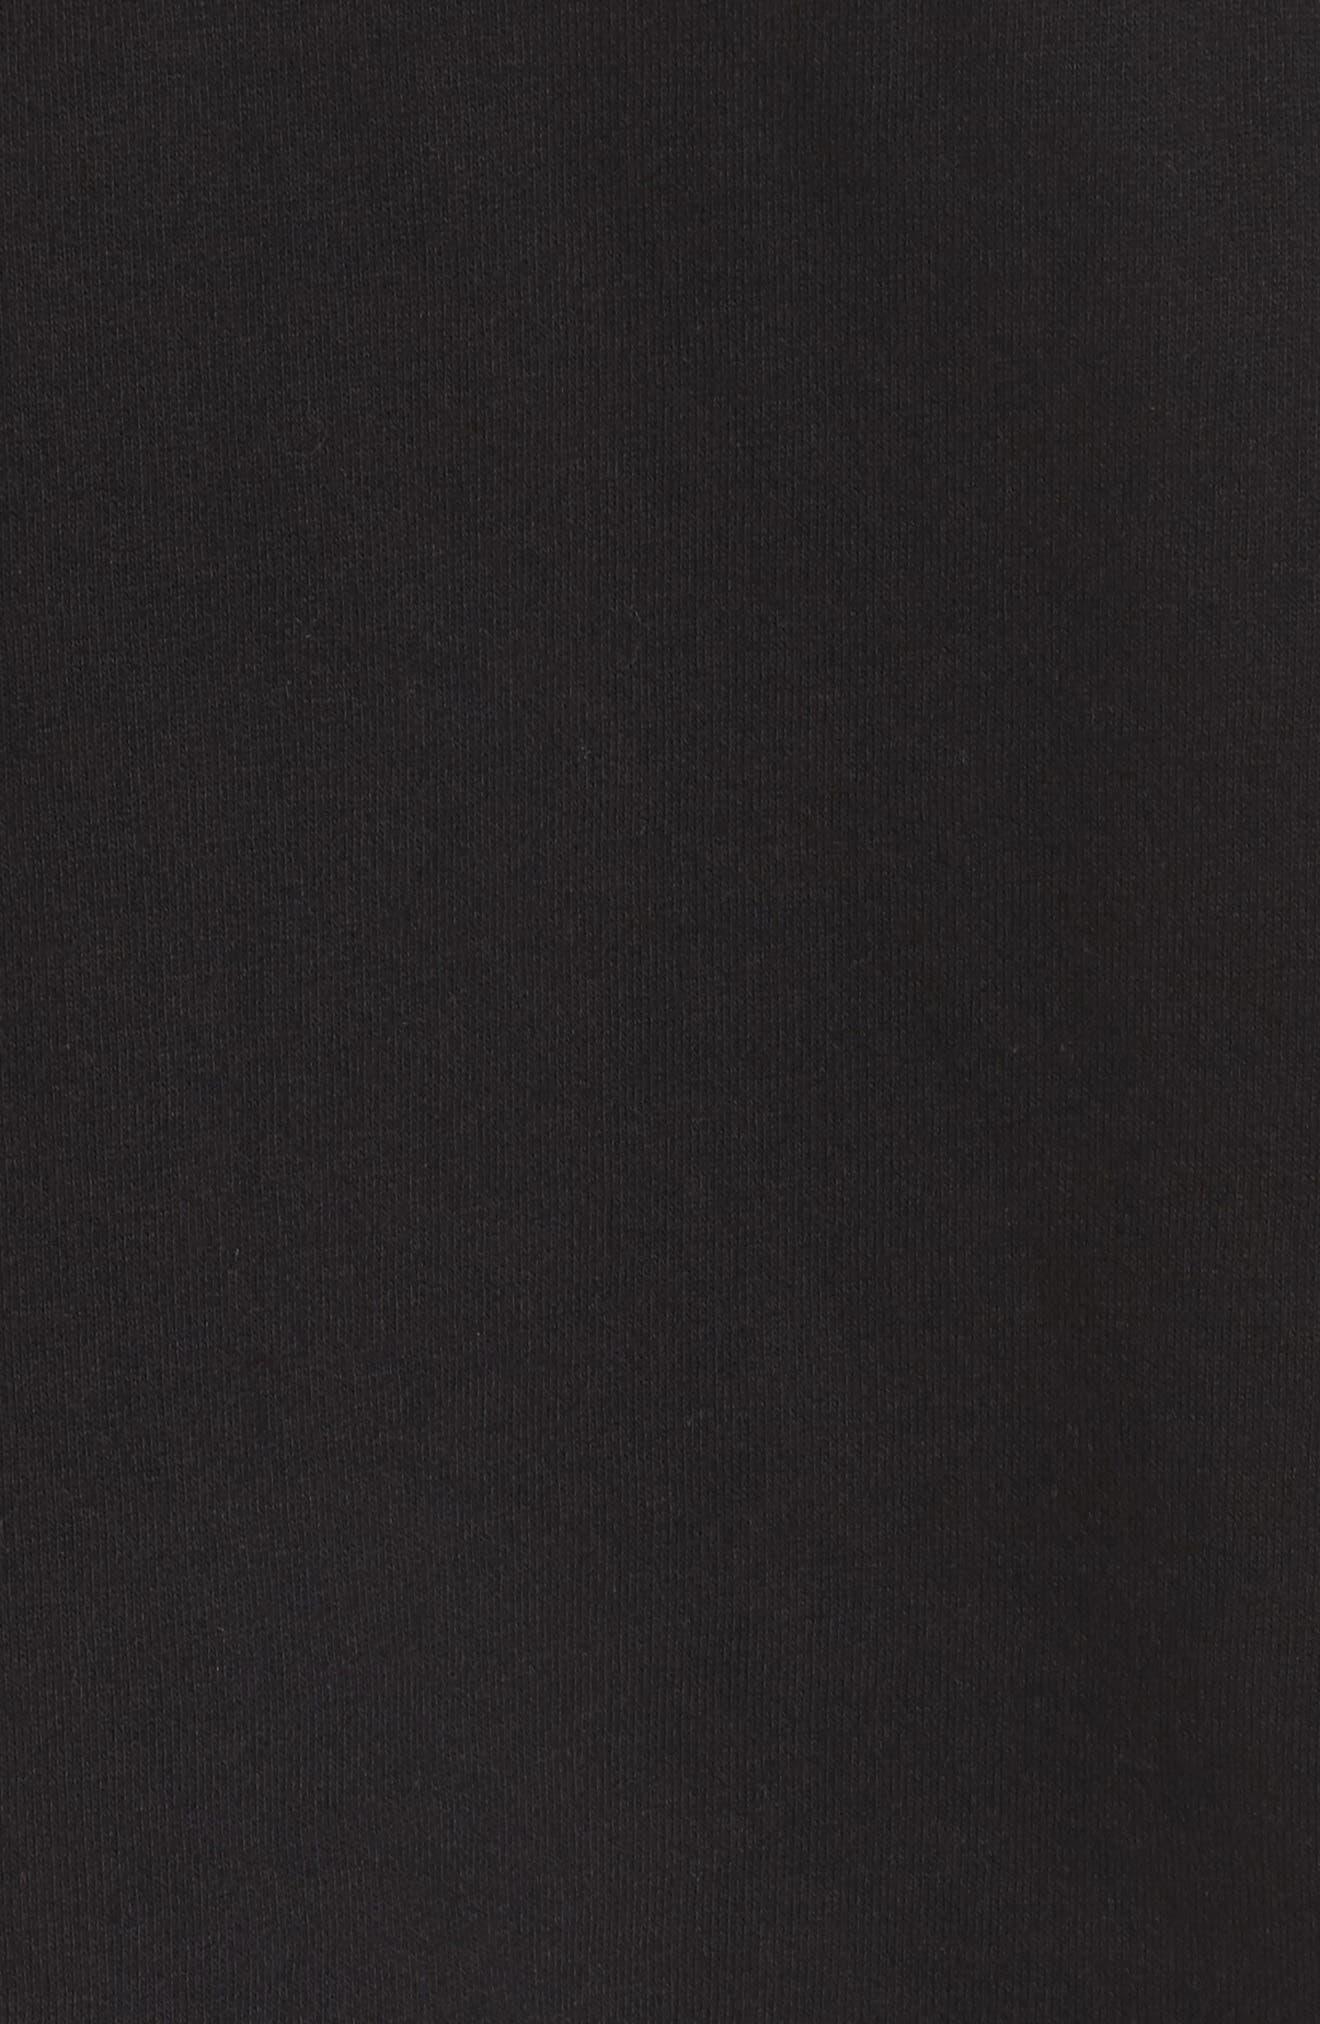 Brunette Raw Hem Sweatshirt,                             Alternate thumbnail 7, color,                             Black